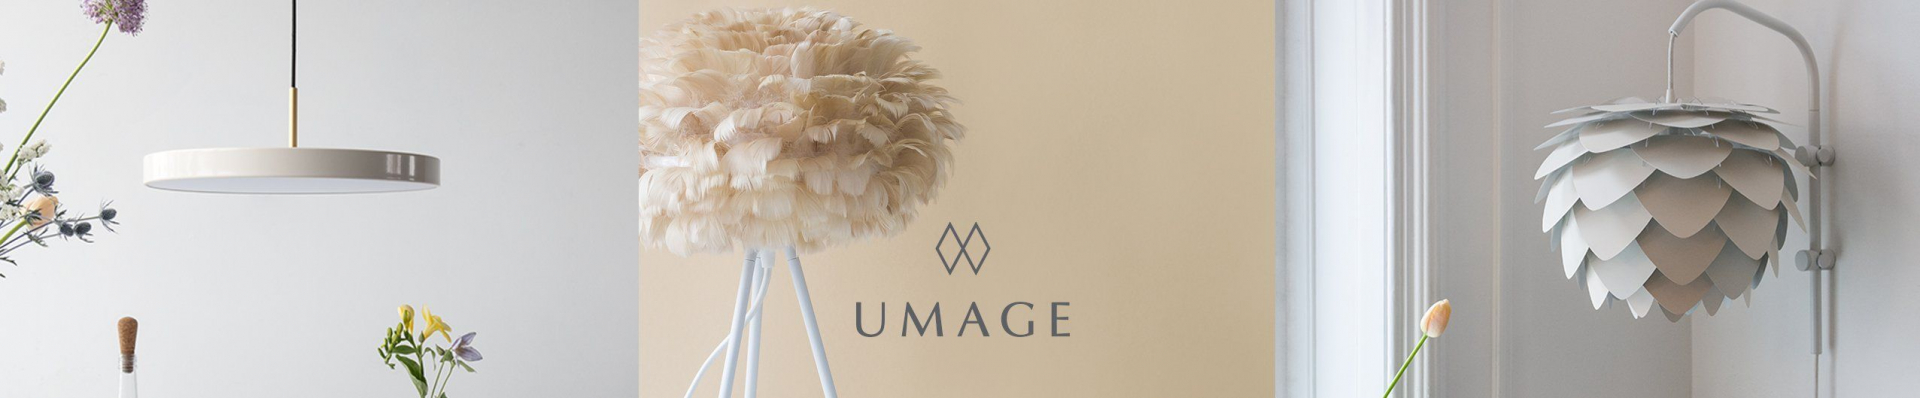 Umage Champagne